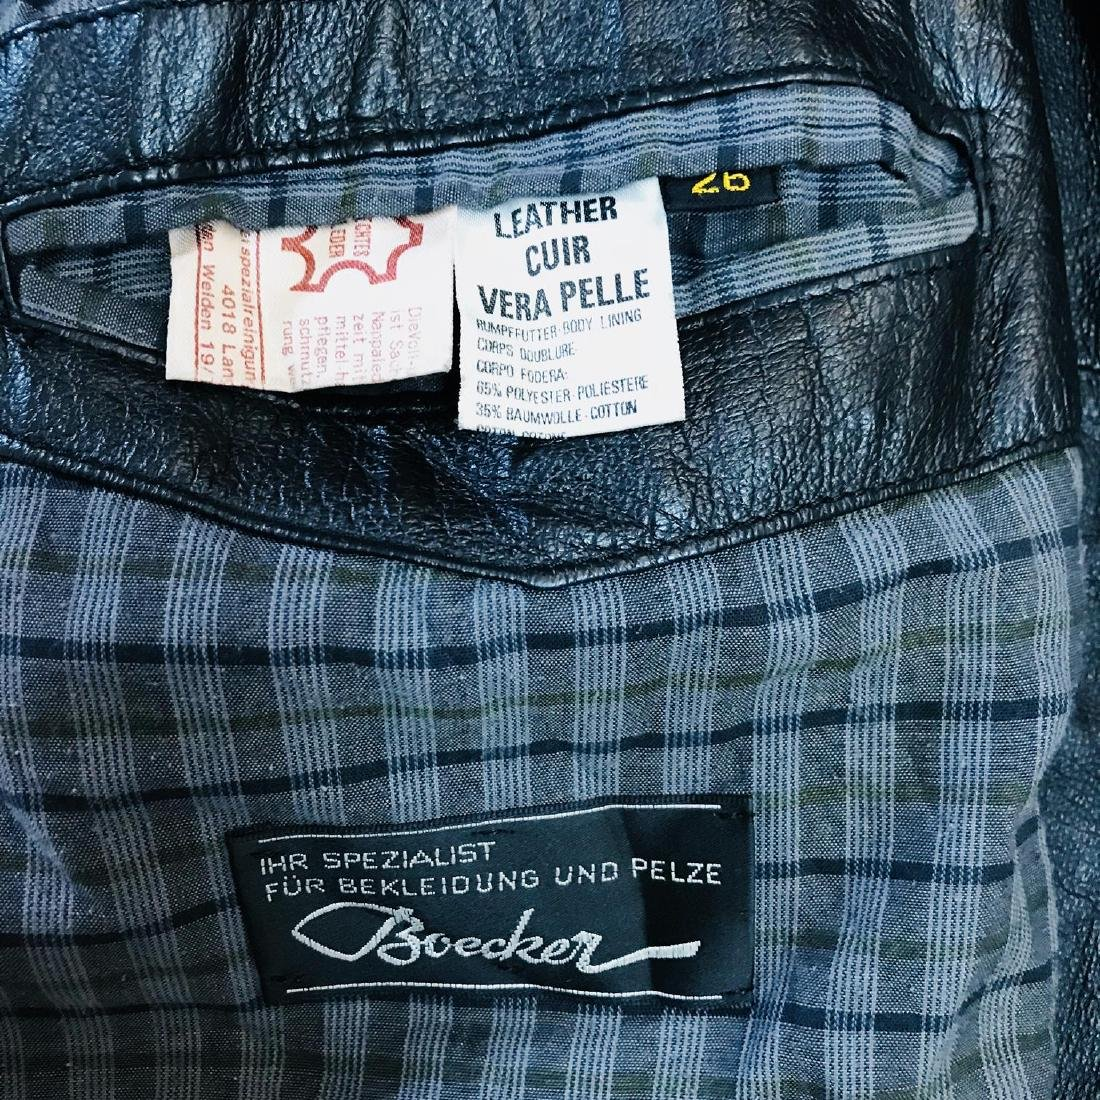 Vintage Men's Boecker Leather Jacket Size US 42 - 8